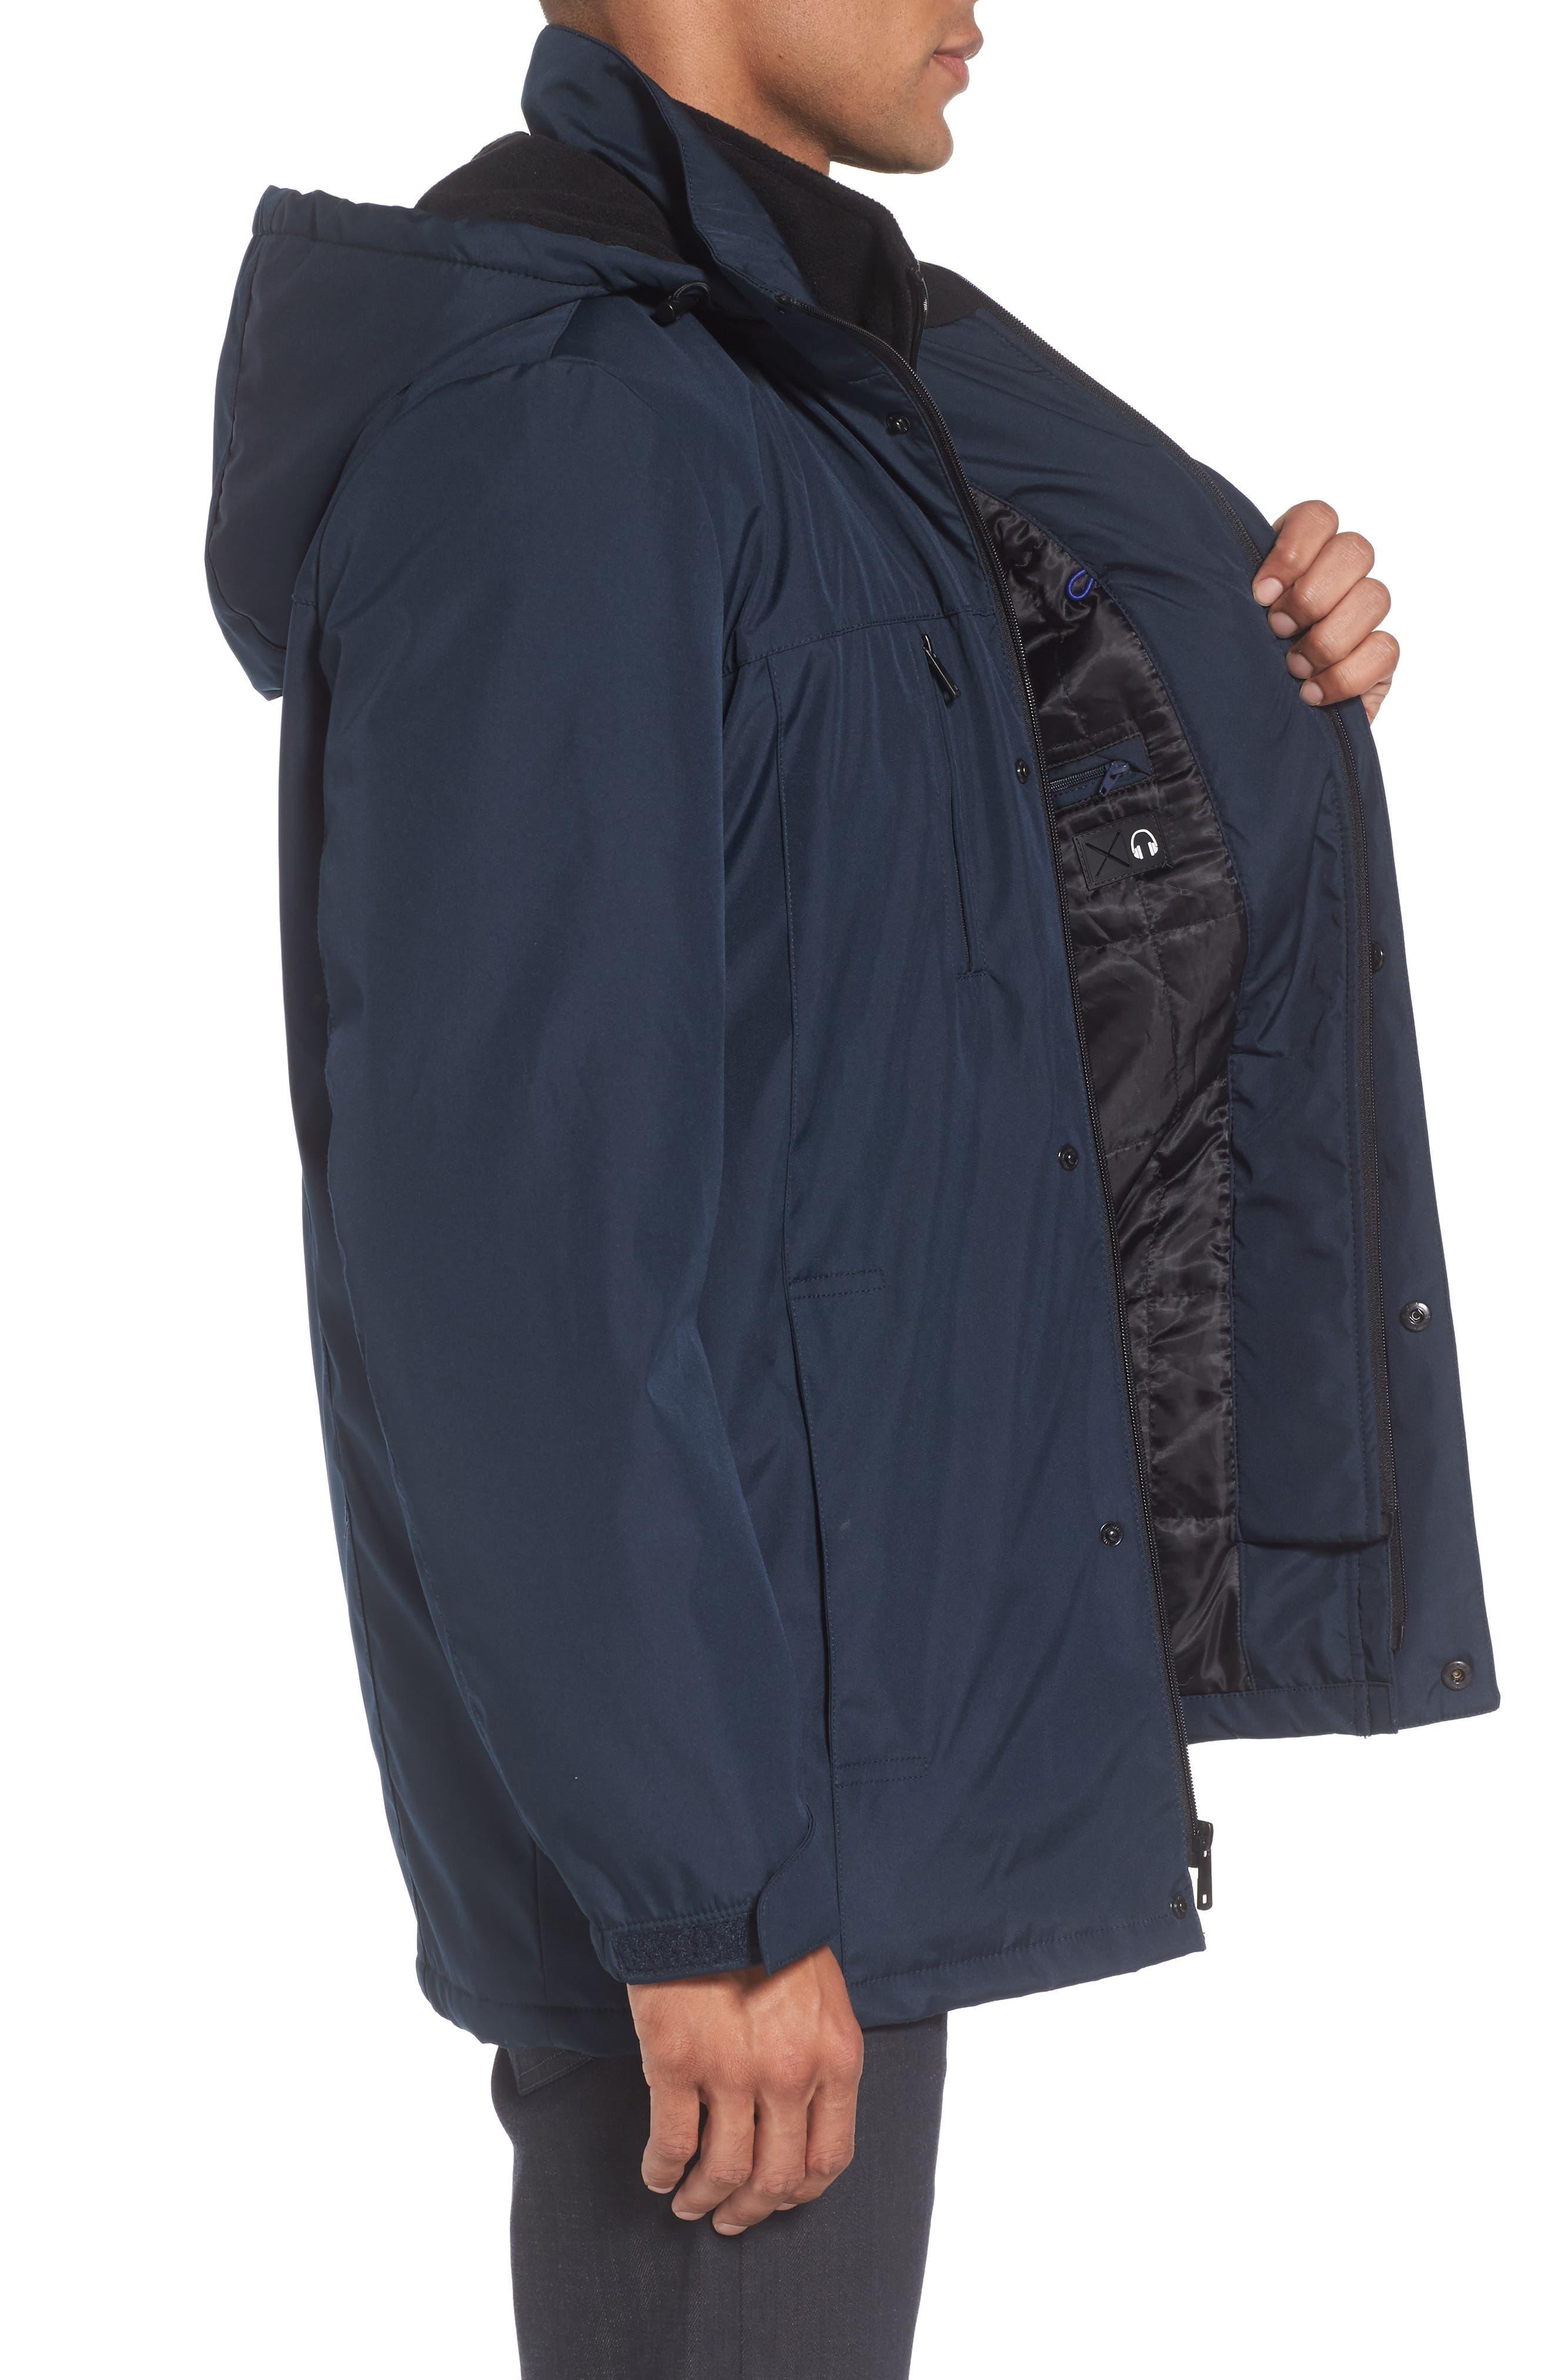 Hooded Jacket with Inset Fleece Bib,                             Alternate thumbnail 12, color,